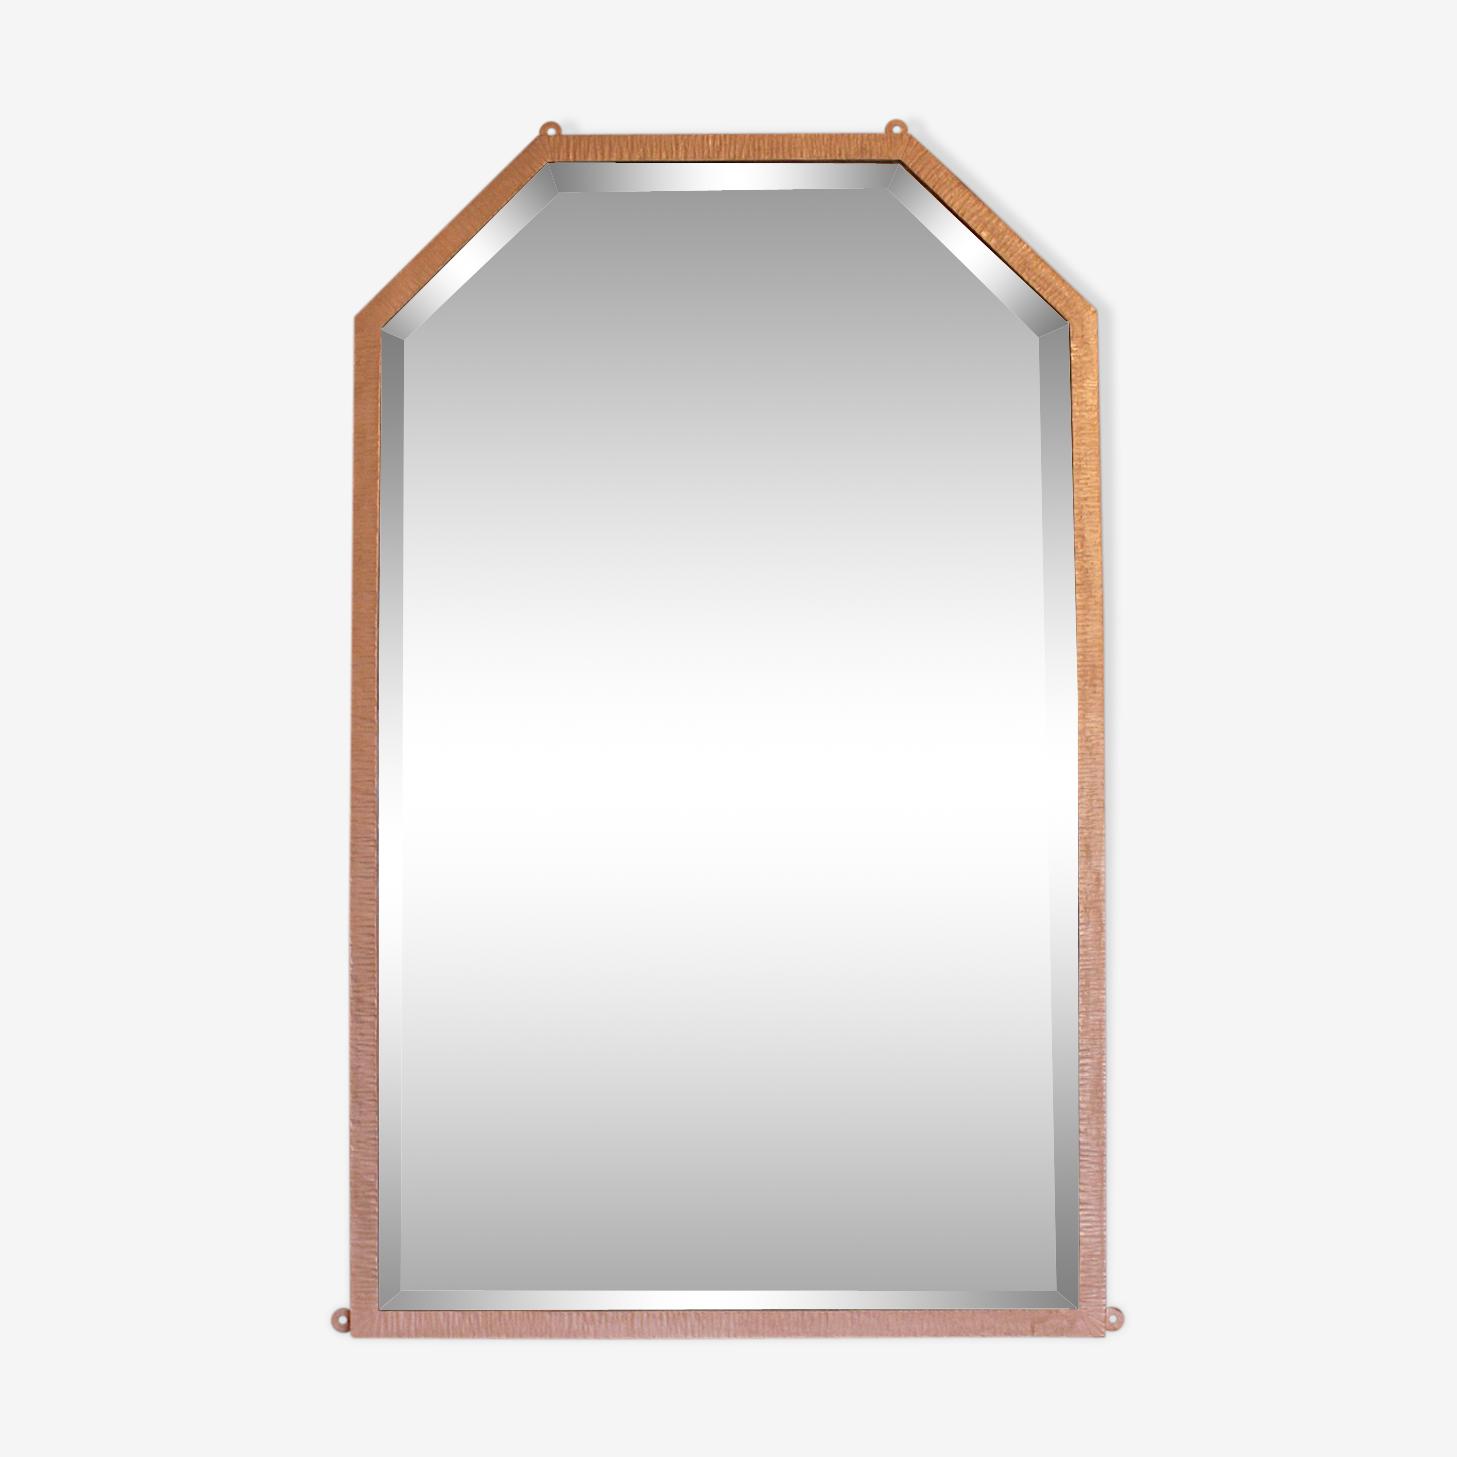 Art deco gold patinated metal mirror pink 65x105cm